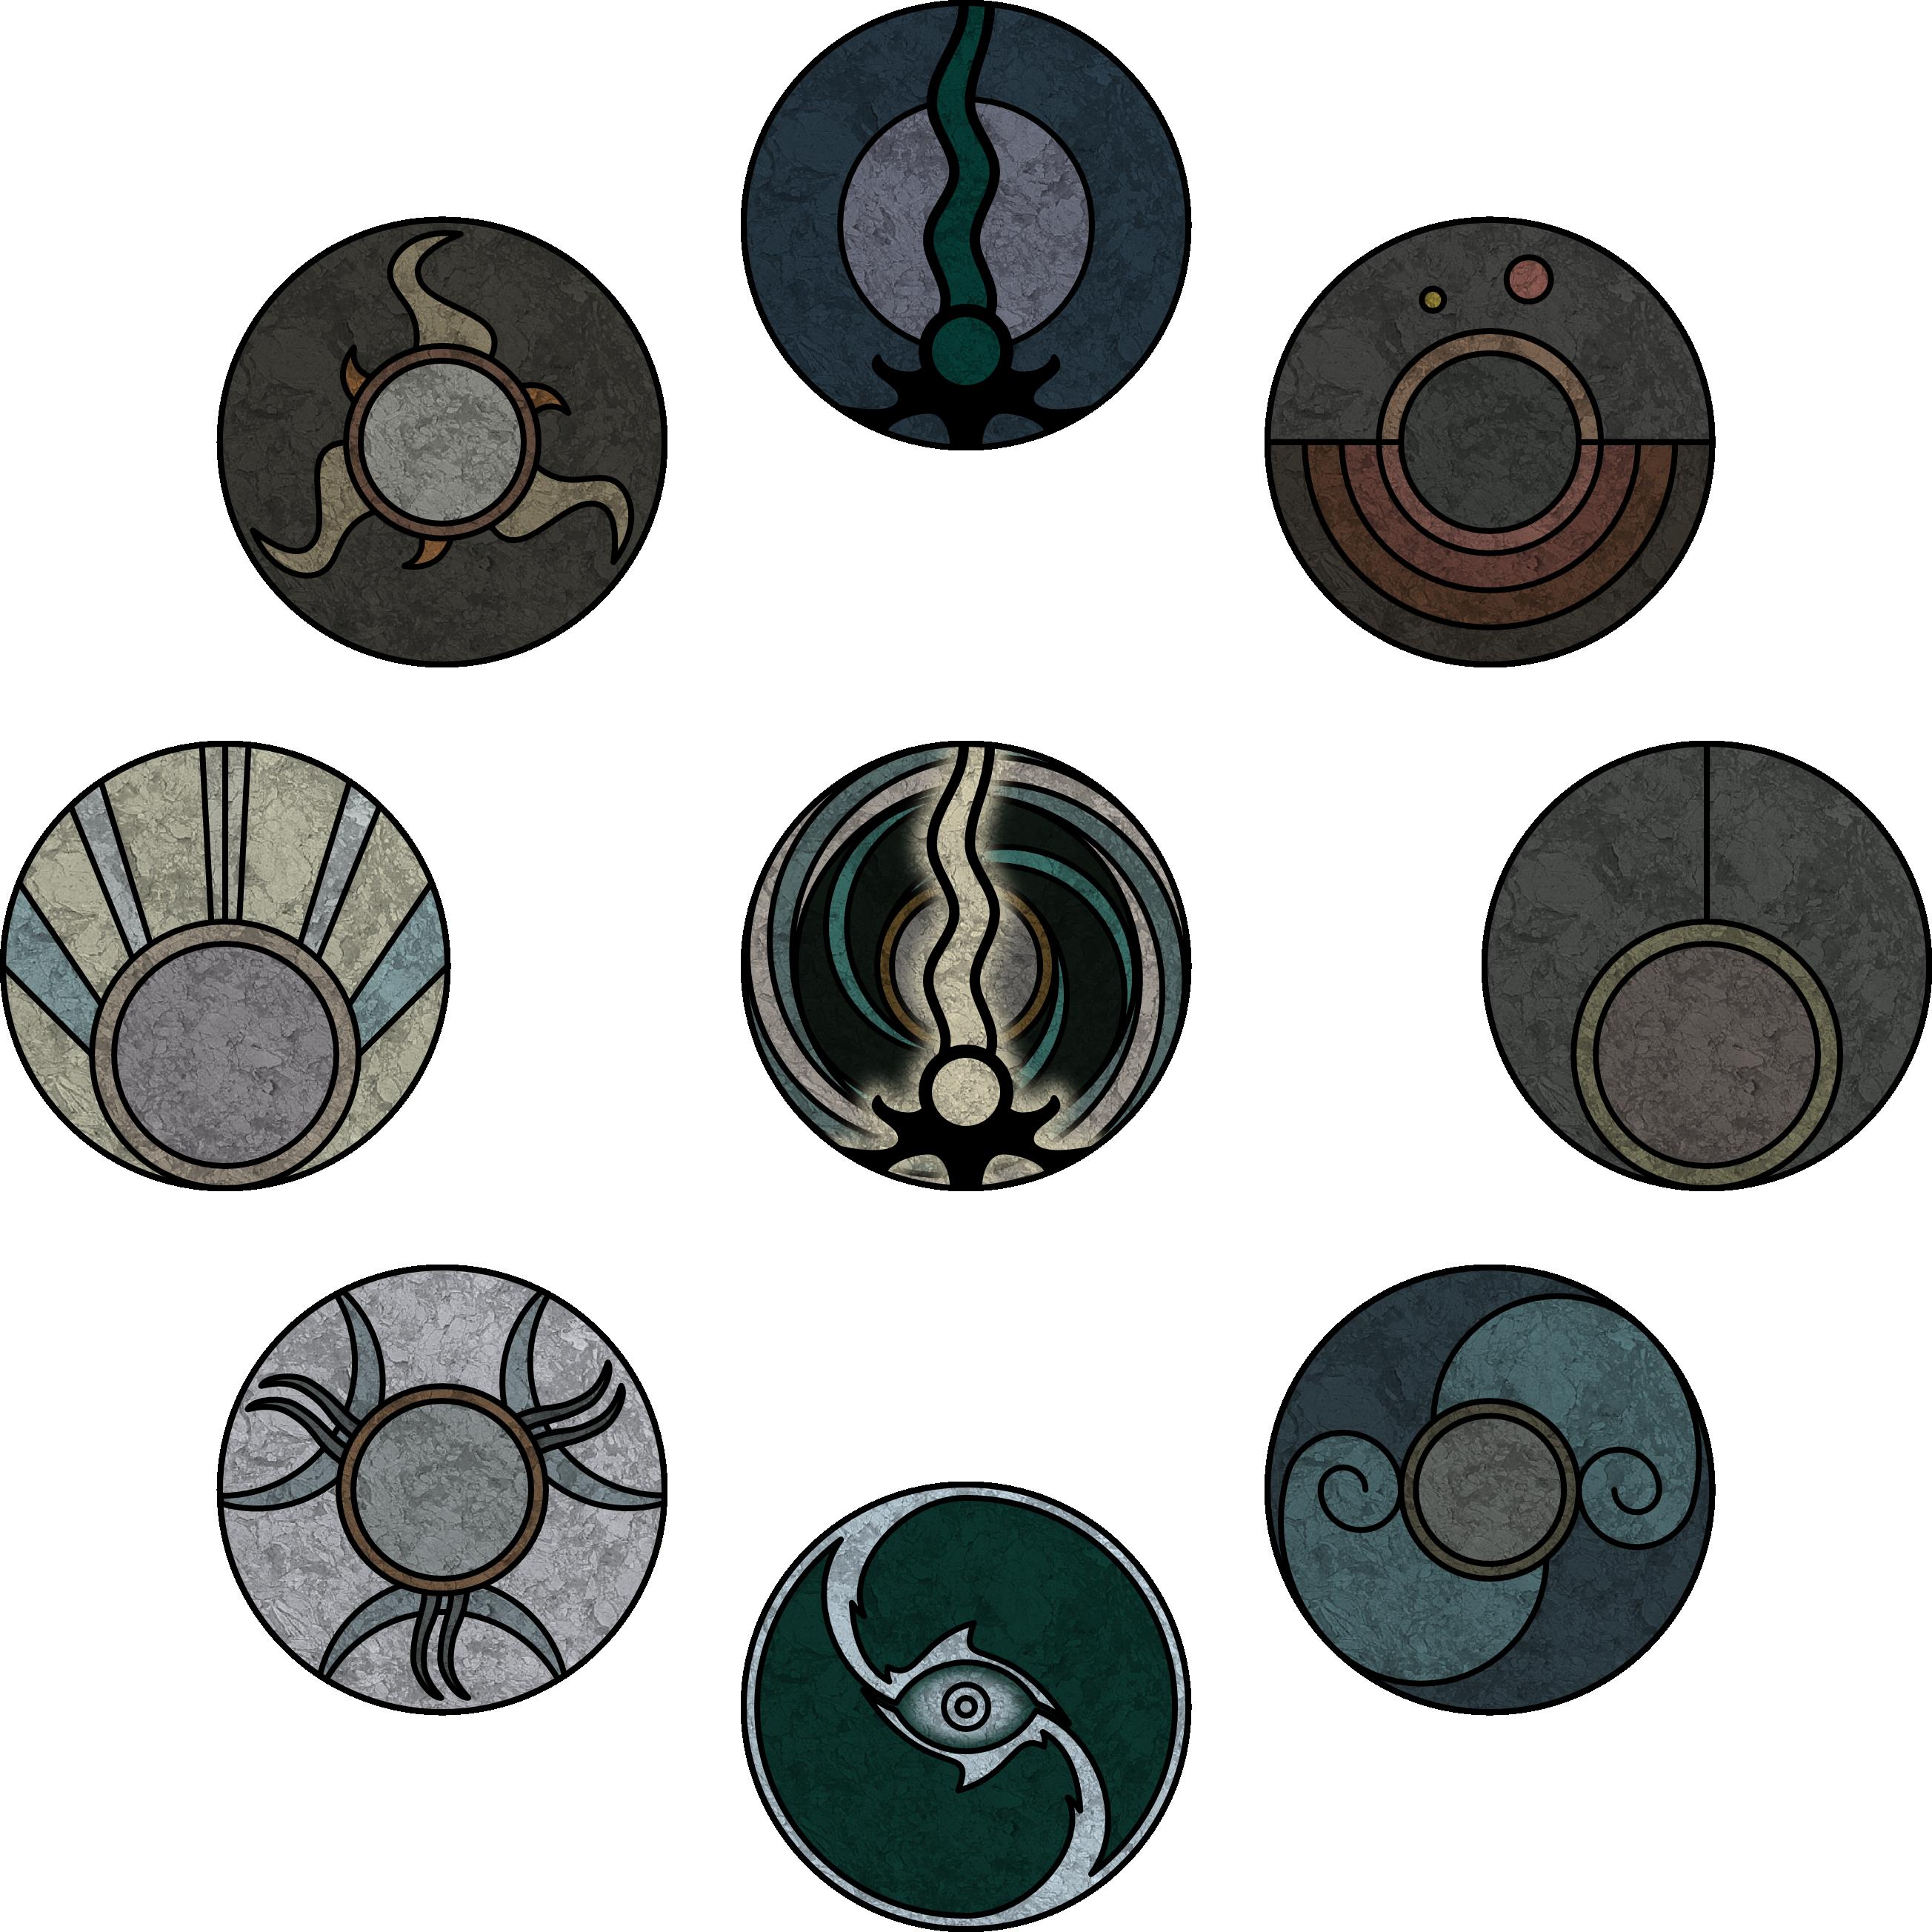 Pin By Stewart Tyler On Gaming Badasses Pinterest Symbols